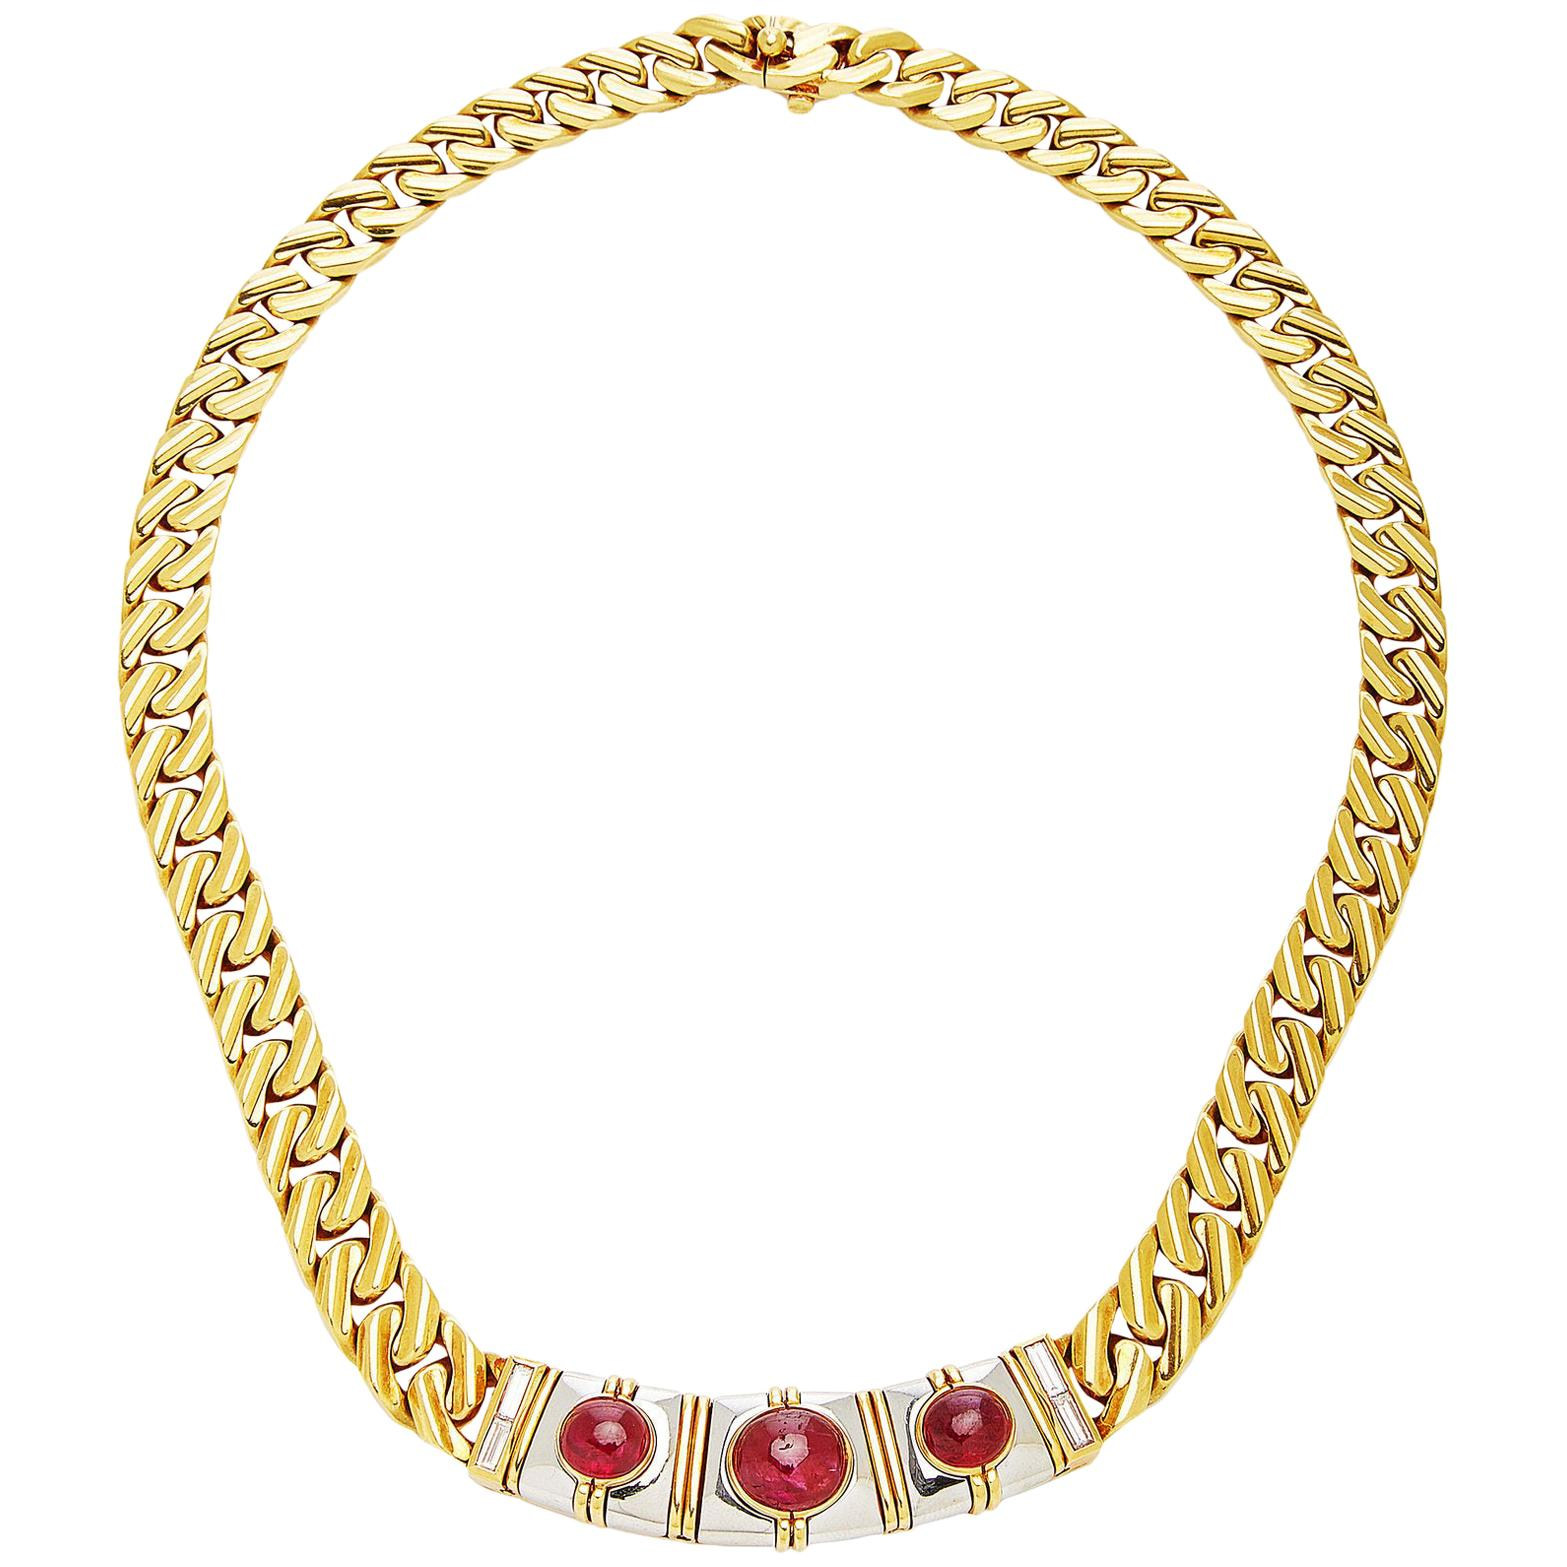 Bulgari Ruby Chain Necklace